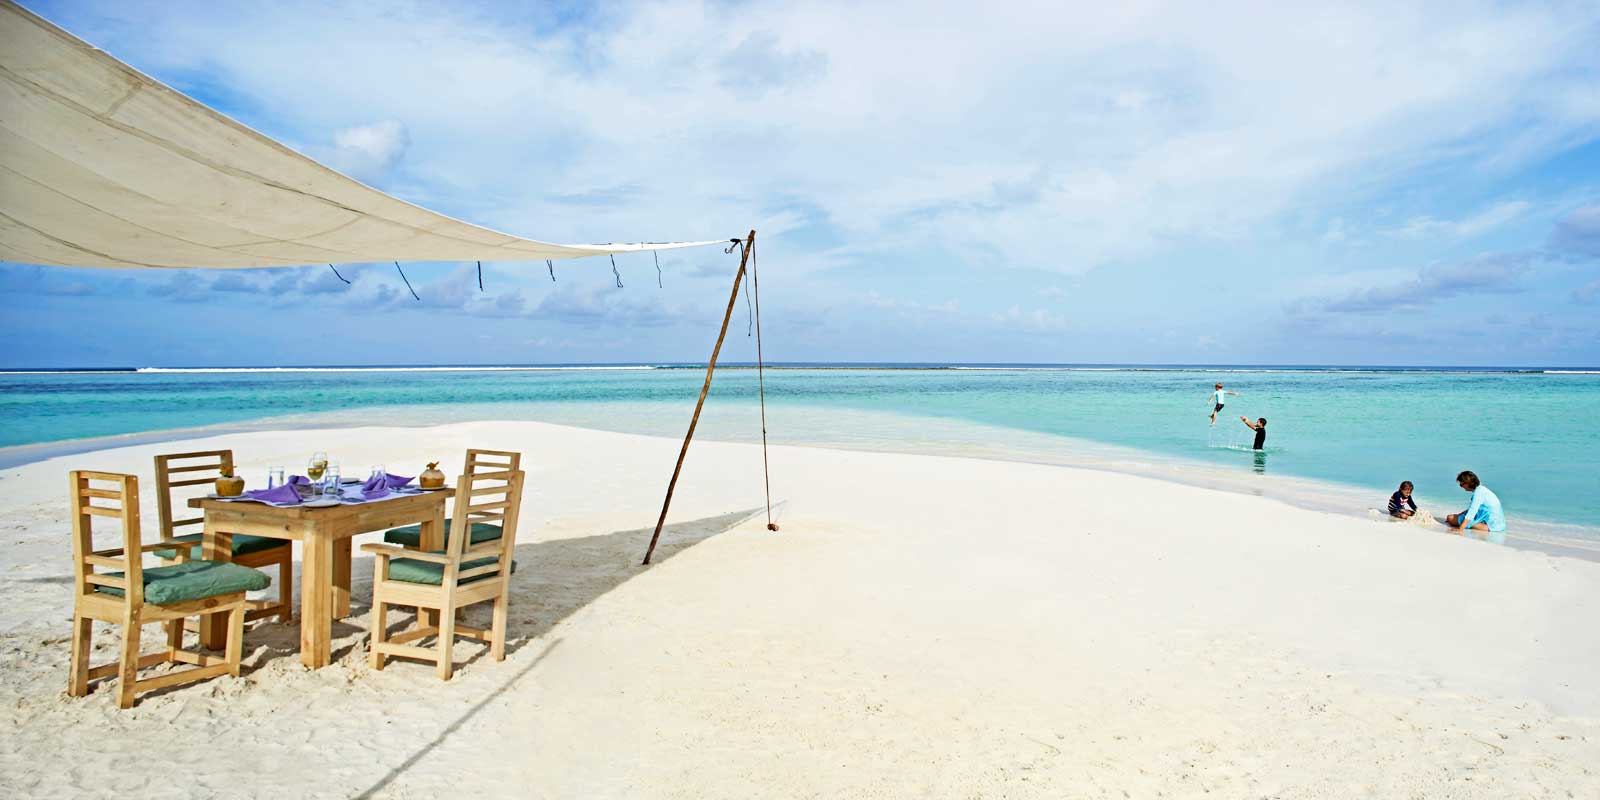 OCOA_TRAVEL_SONEVA_HOTELS_JANI_RESORT_MALDIVES_7